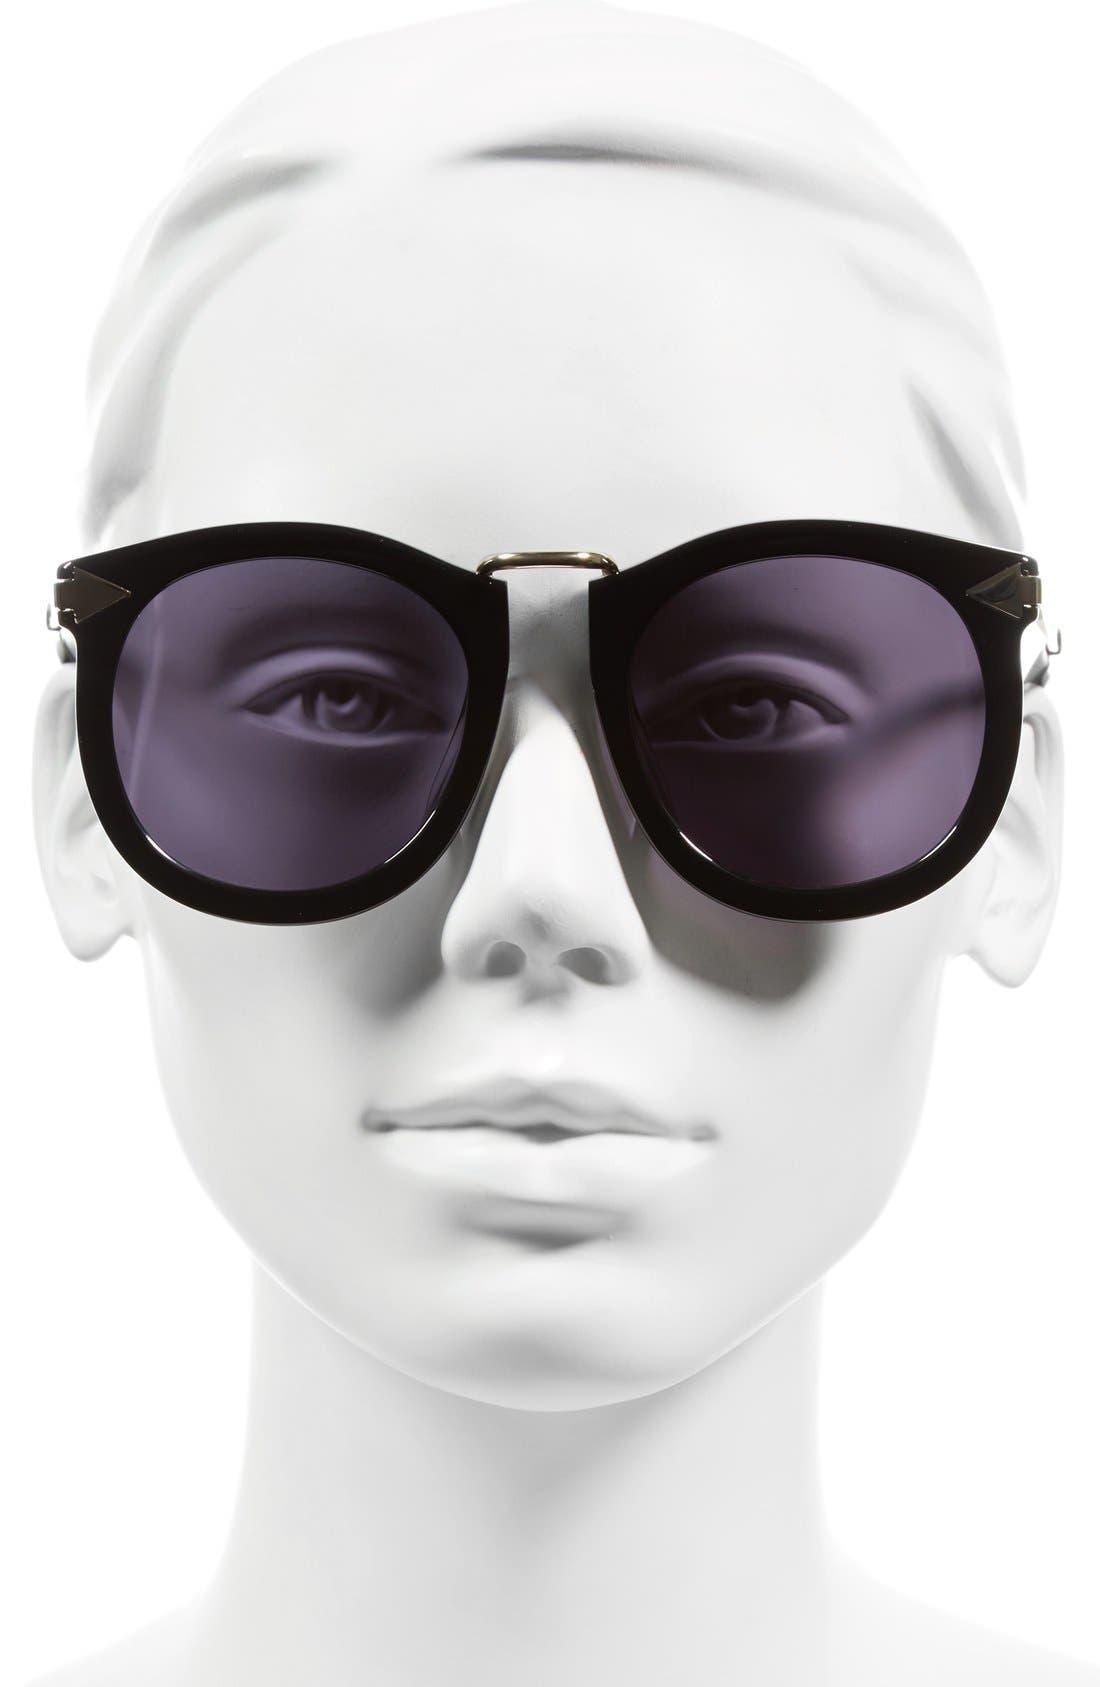 Alternative Fit Super Lunar - Arrowed by Karen 50mm Sunglasses,                             Alternate thumbnail 7, color,